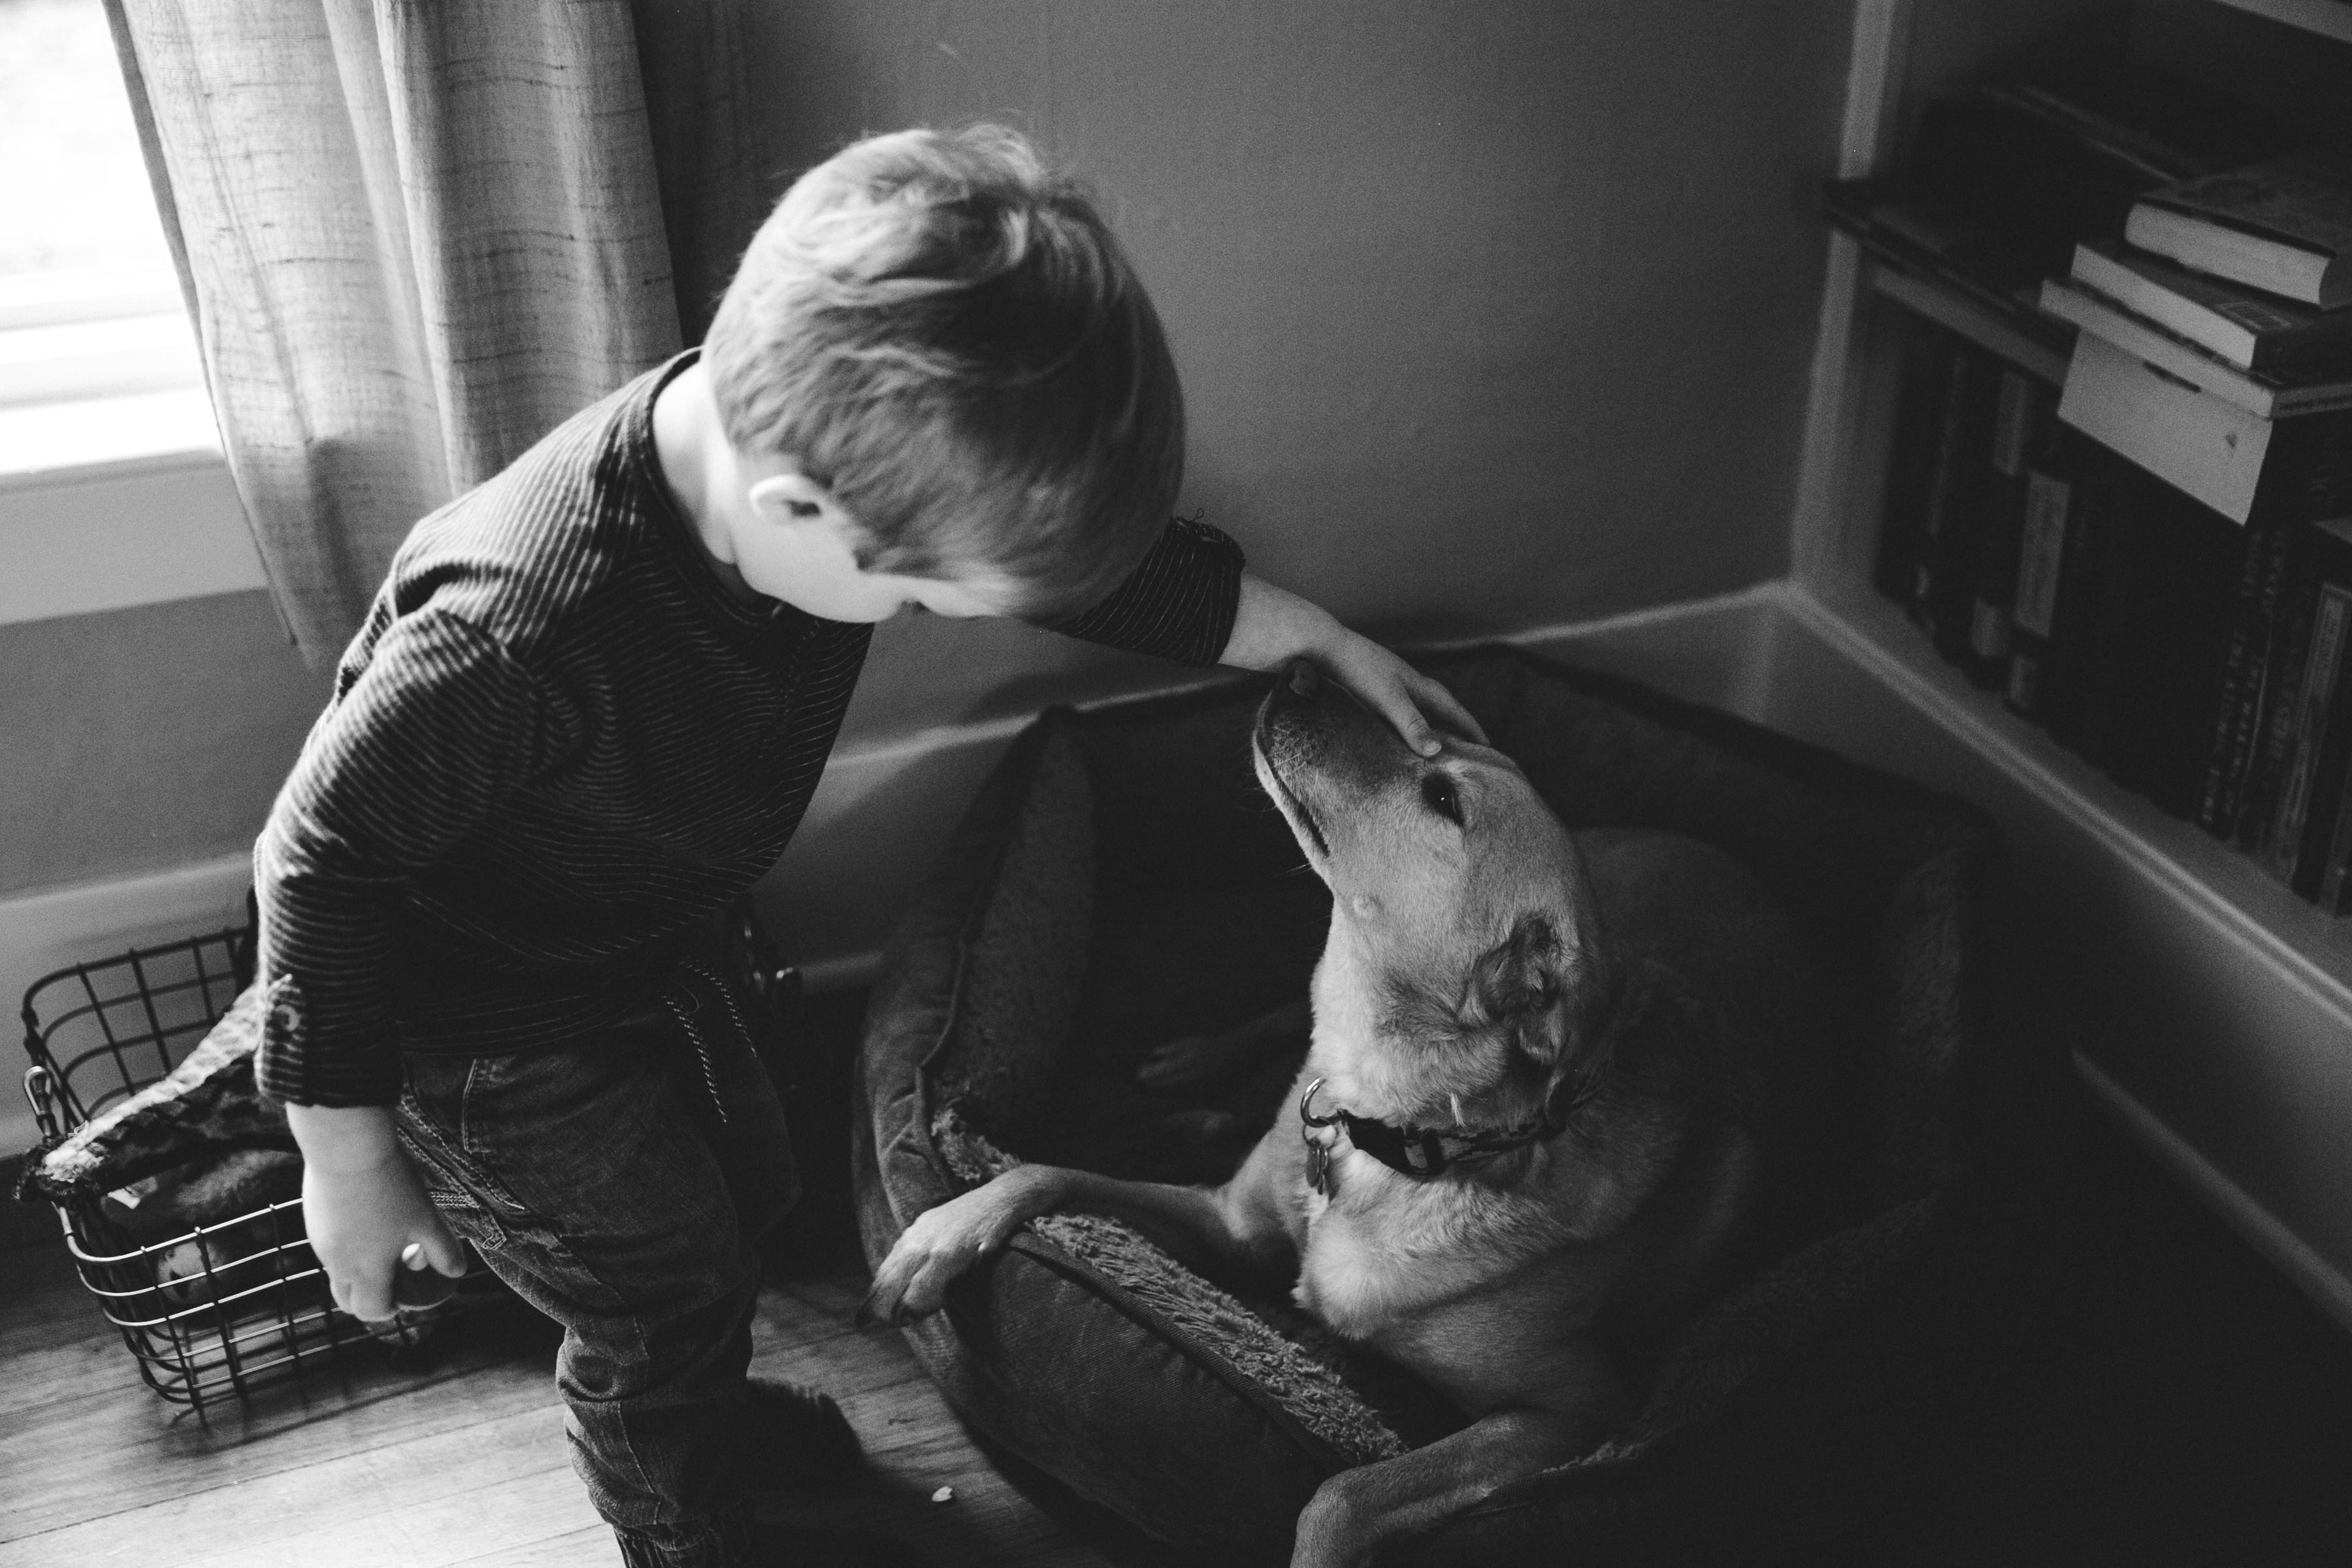 Lucas_familyphotos11-2017_bw_TariGunstonePhotography-2